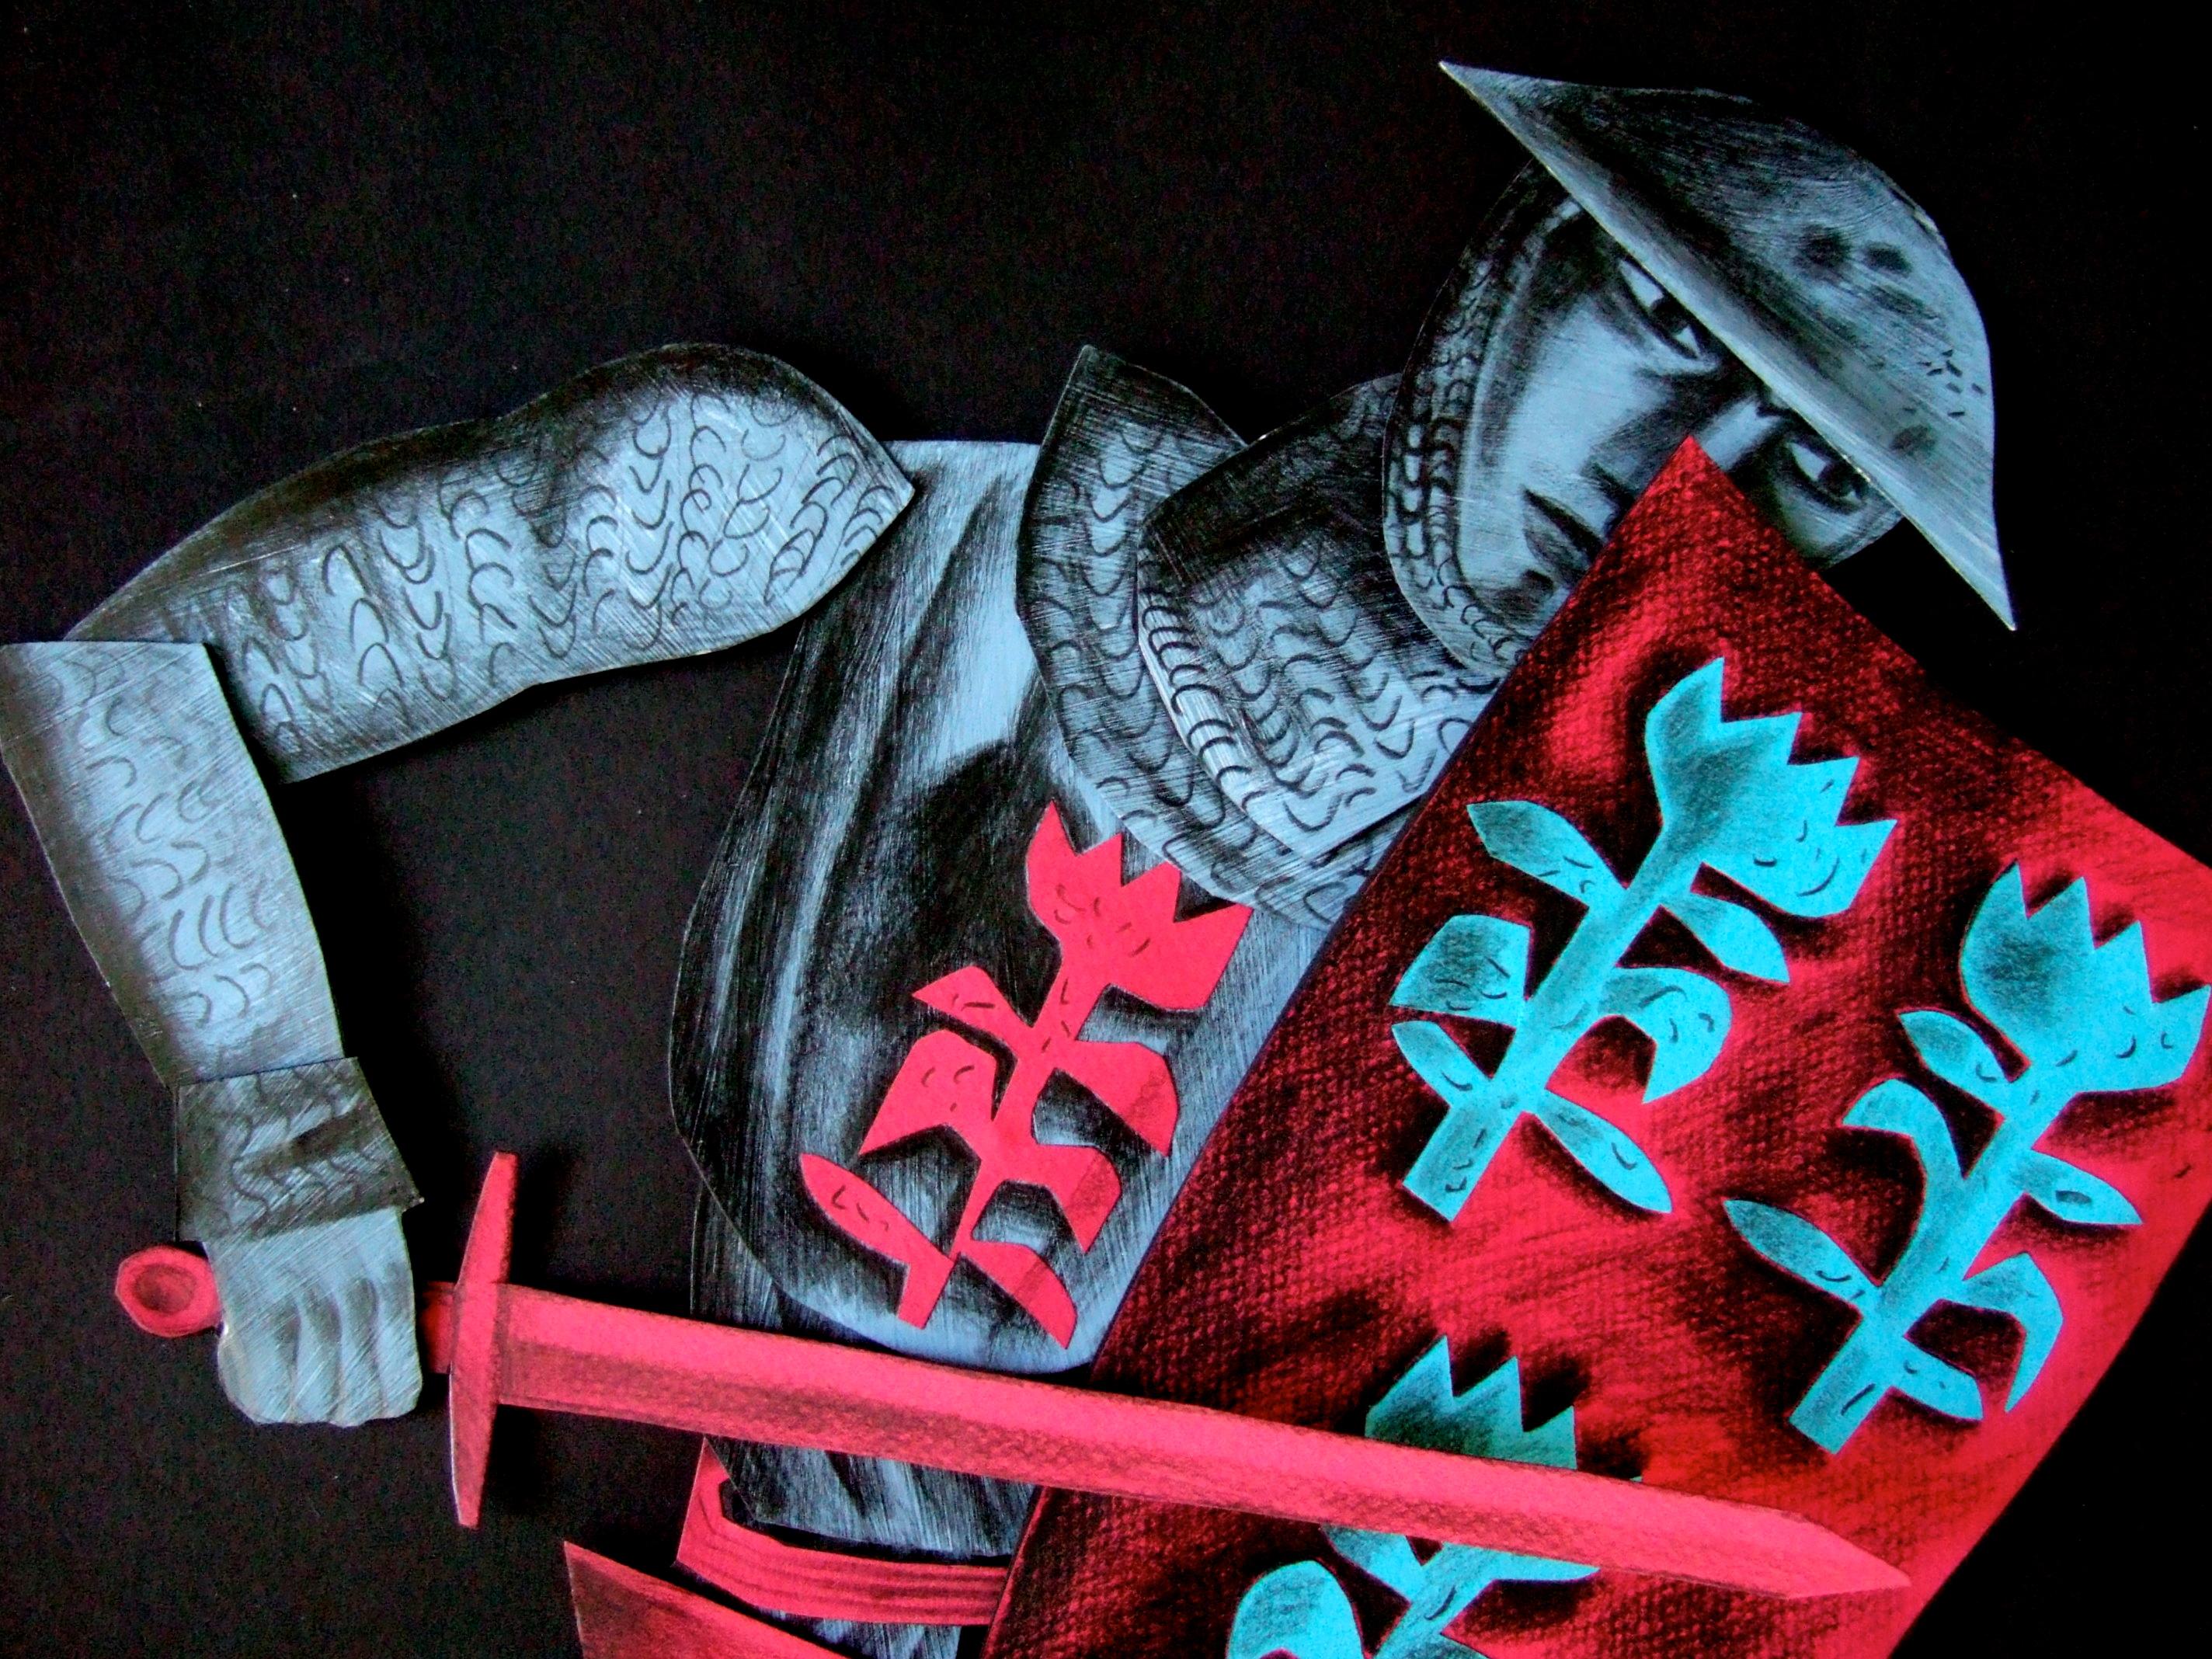 dan bugg and penfold press clive hicks jenkins artlog the making of gawain